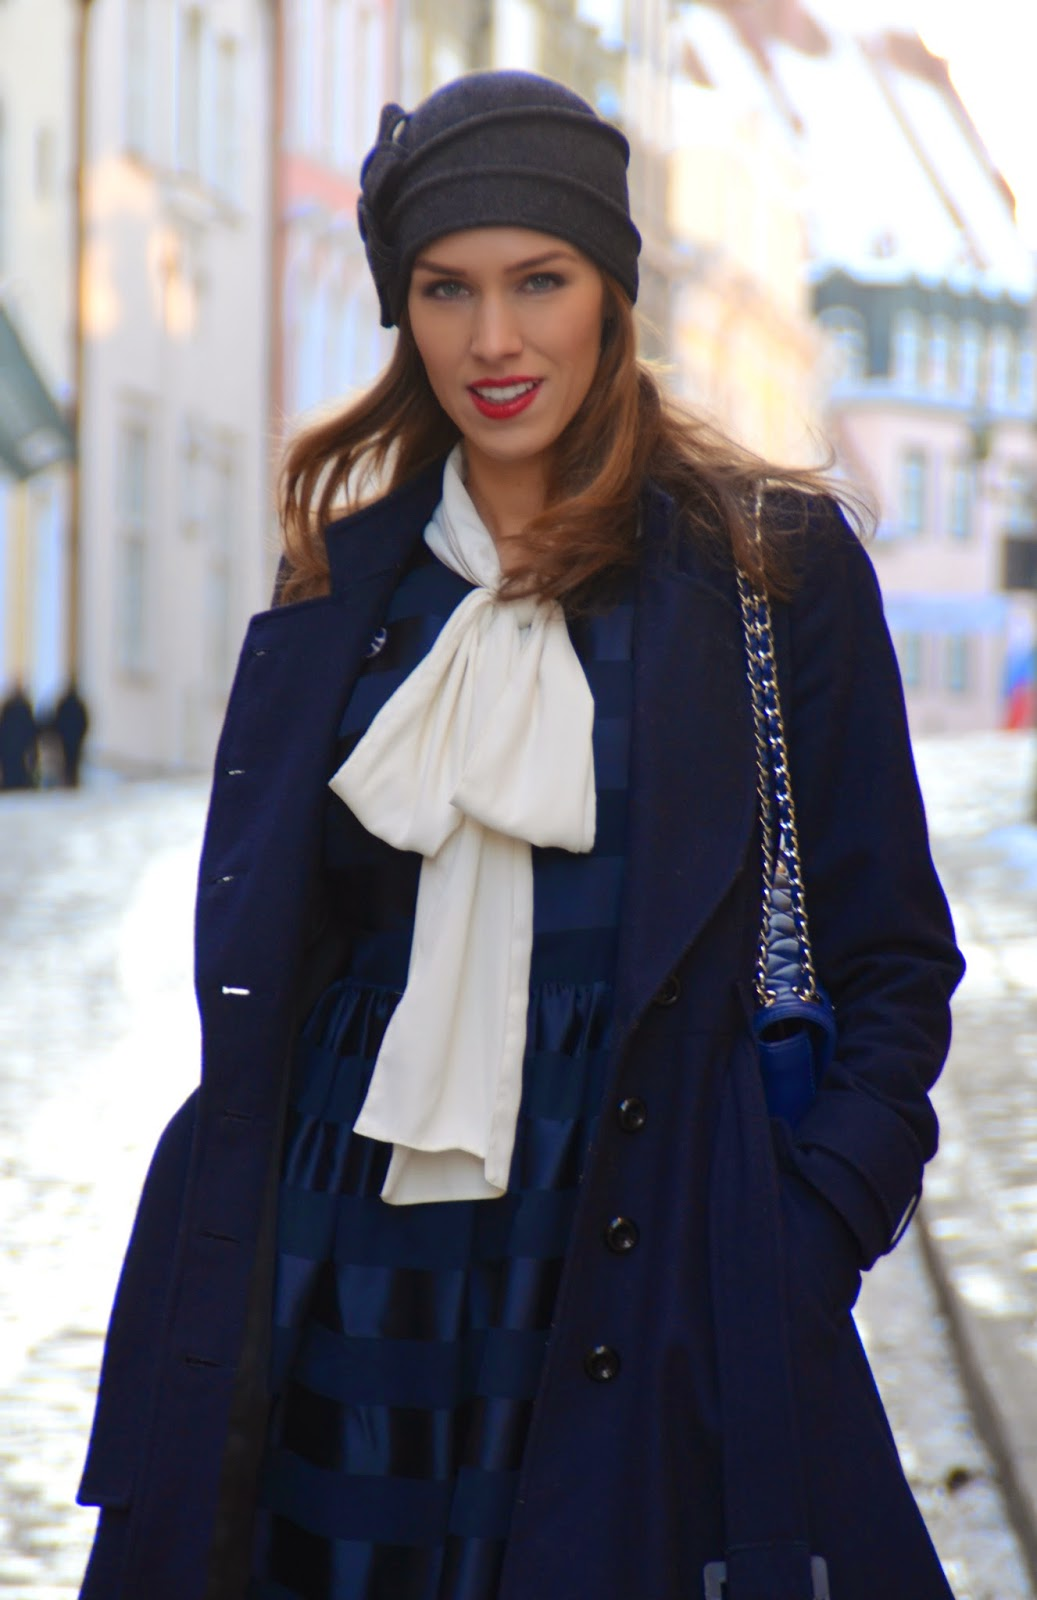 asos-white-pussybow-blouse-lindex-sheer-blue-dress